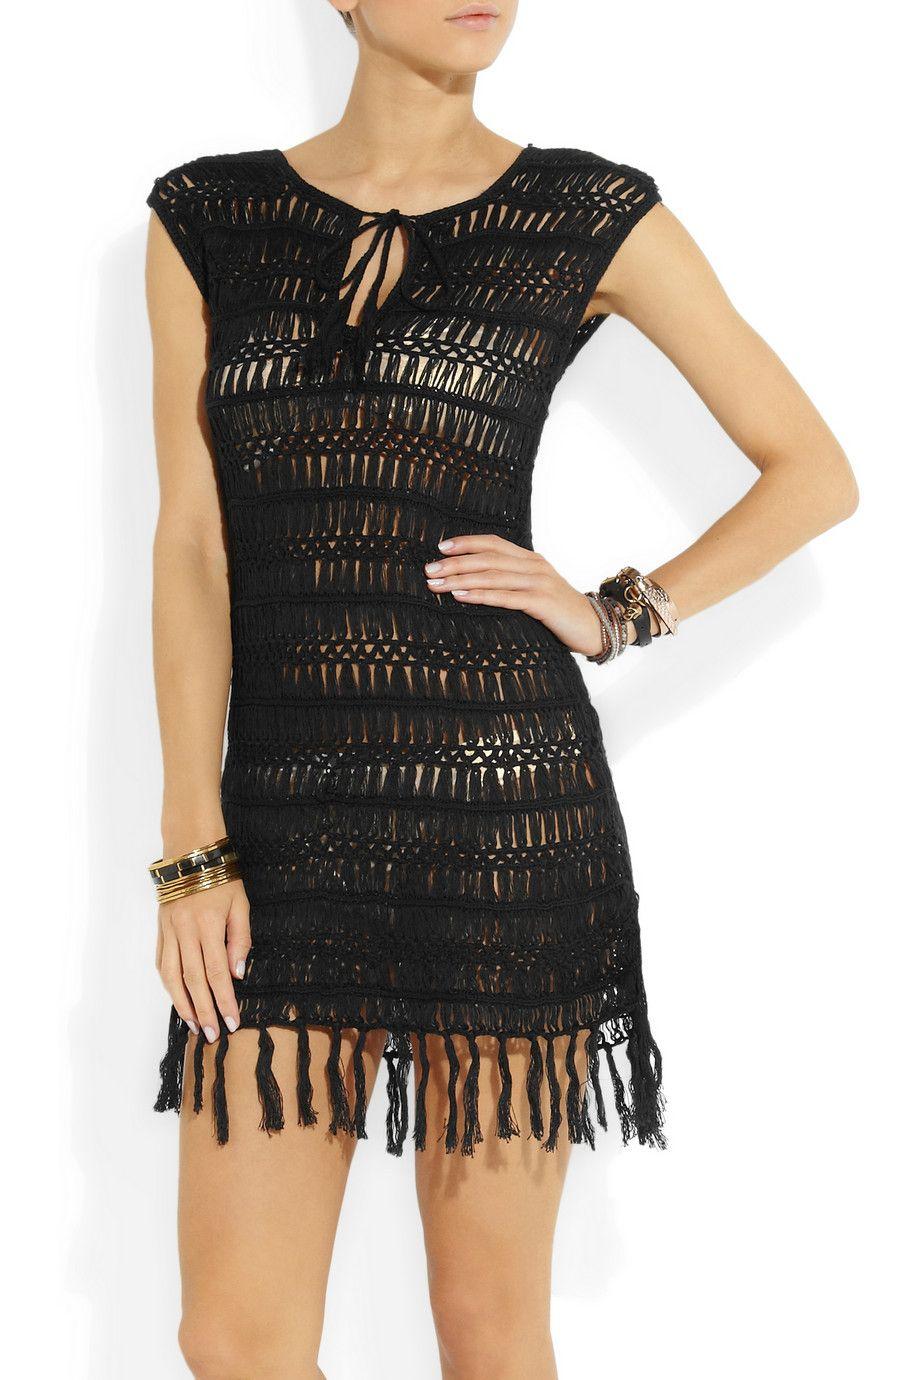 Melissa Odabash|Barrie macramé cotton dress